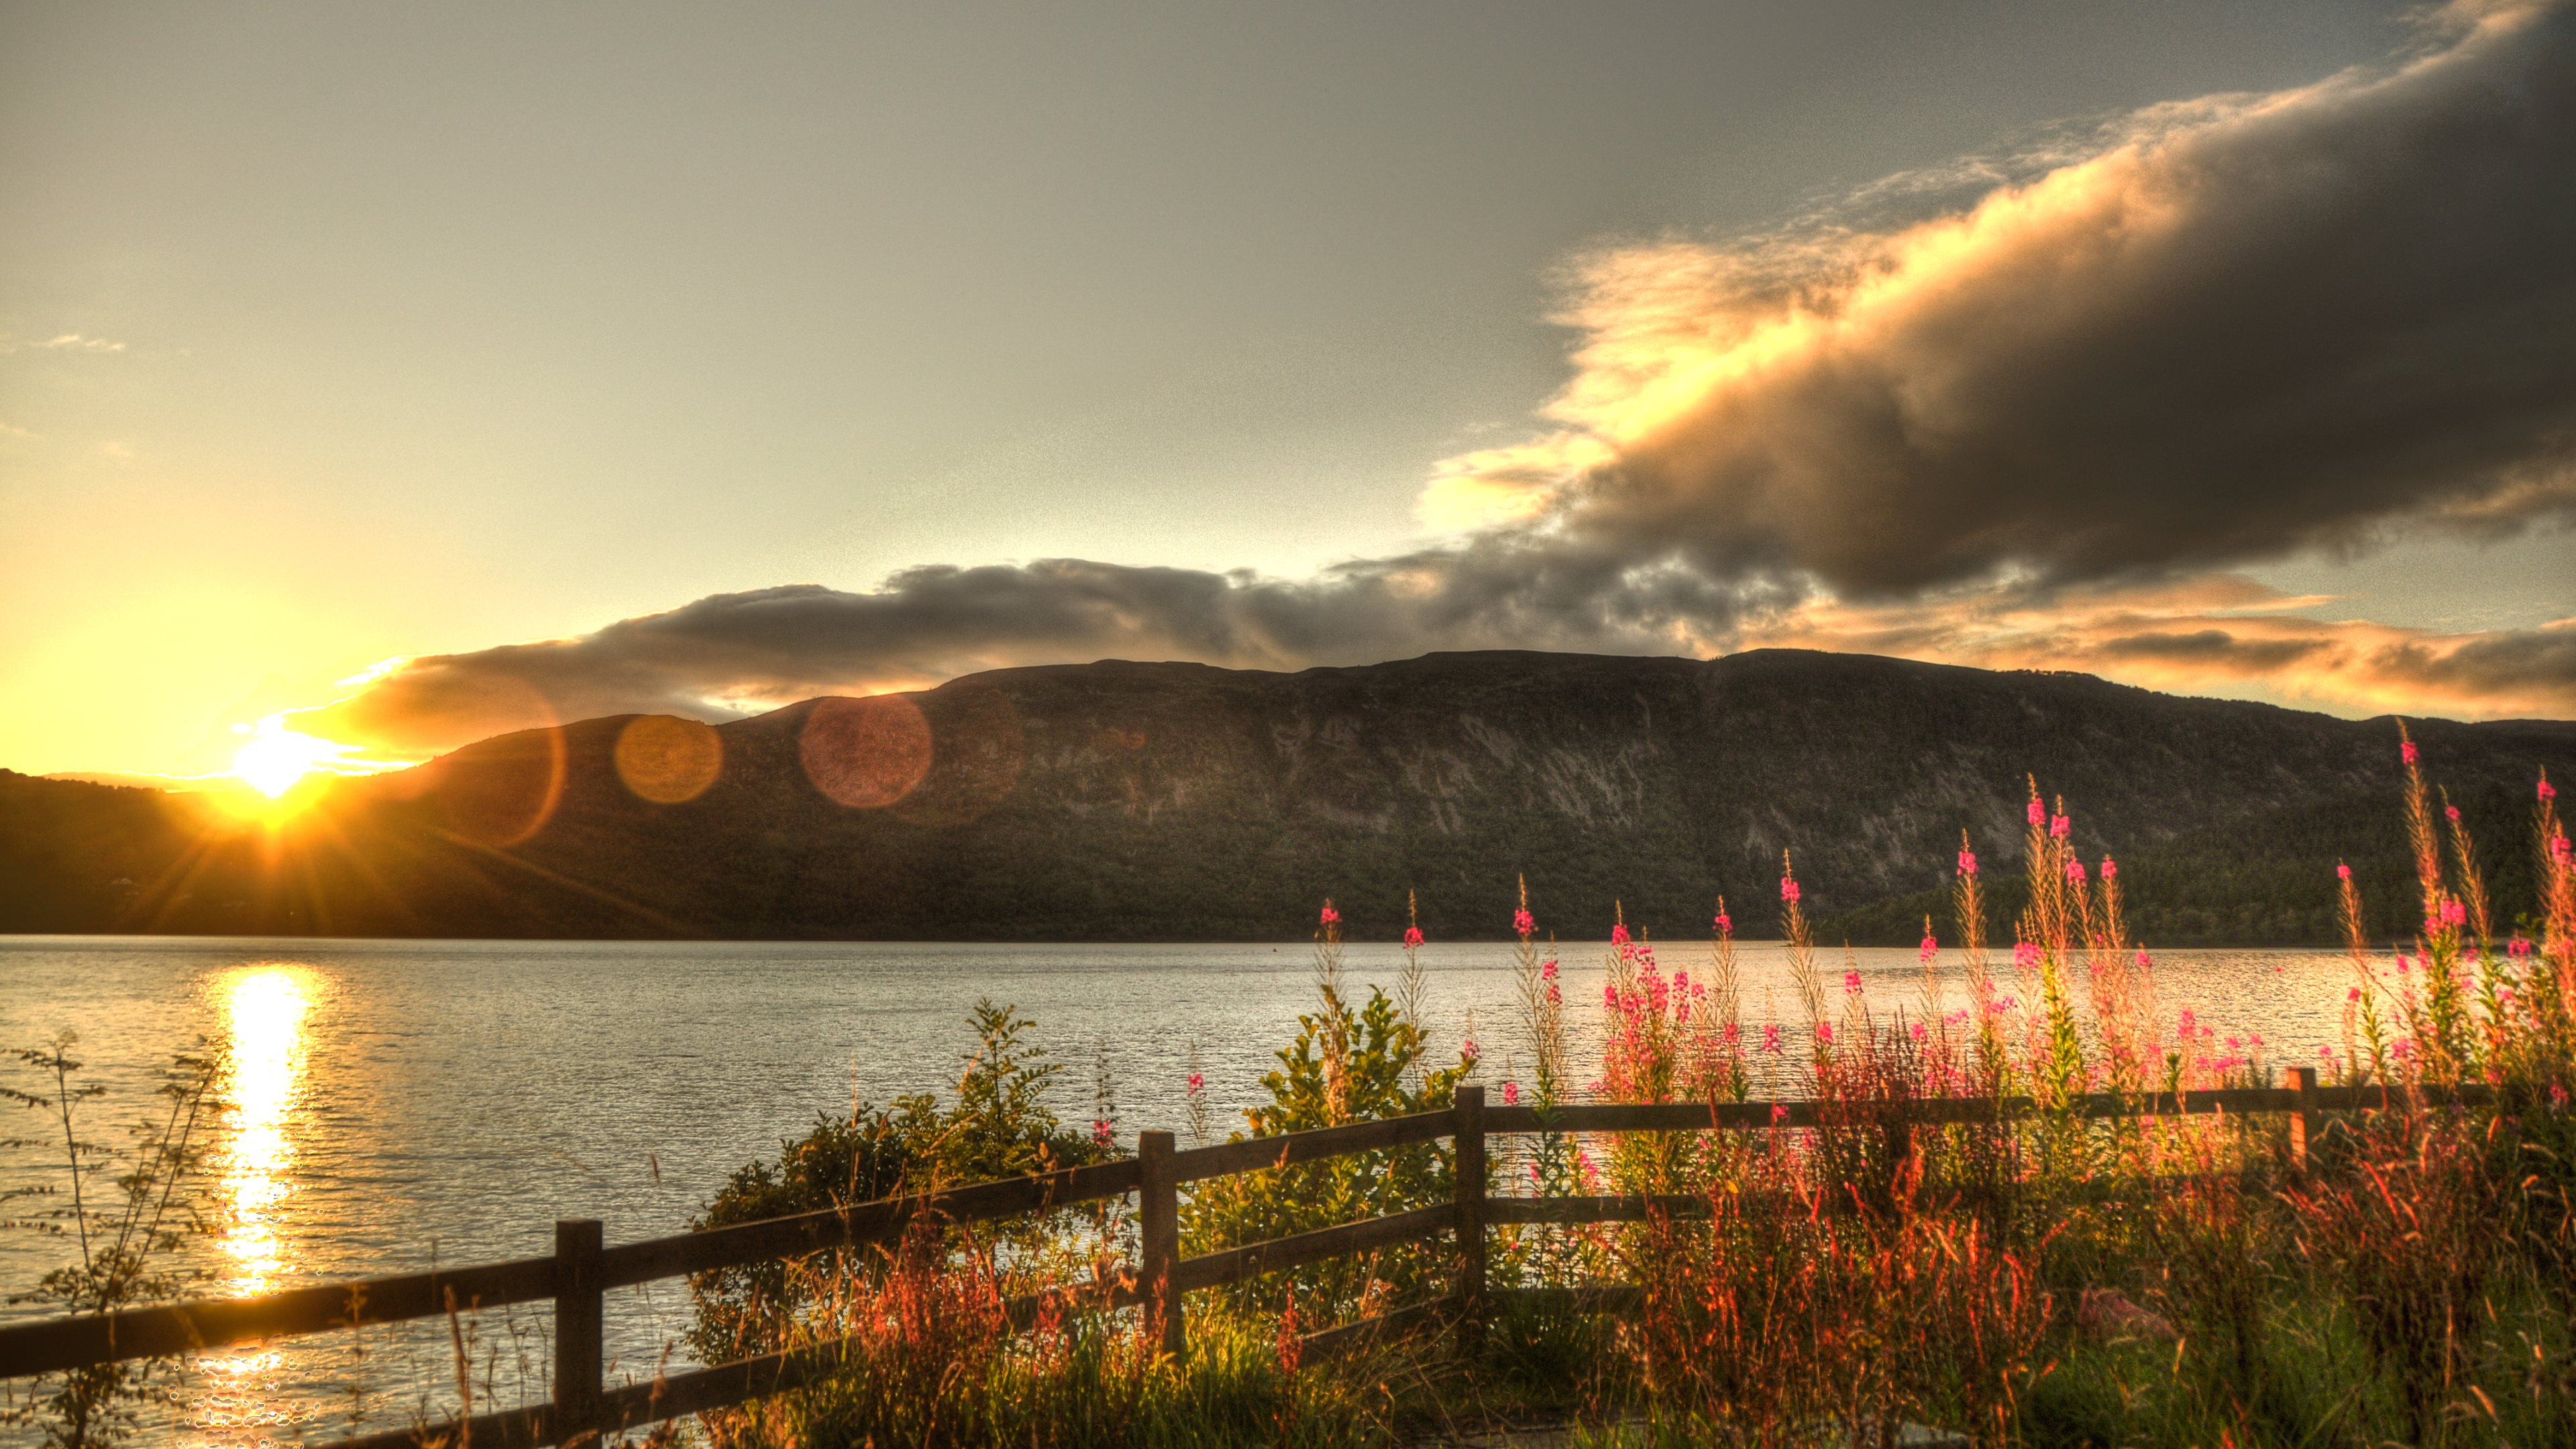 Ultra 4K Wallpaper 17 Sunset over the Loch Ness lake 3840x2160